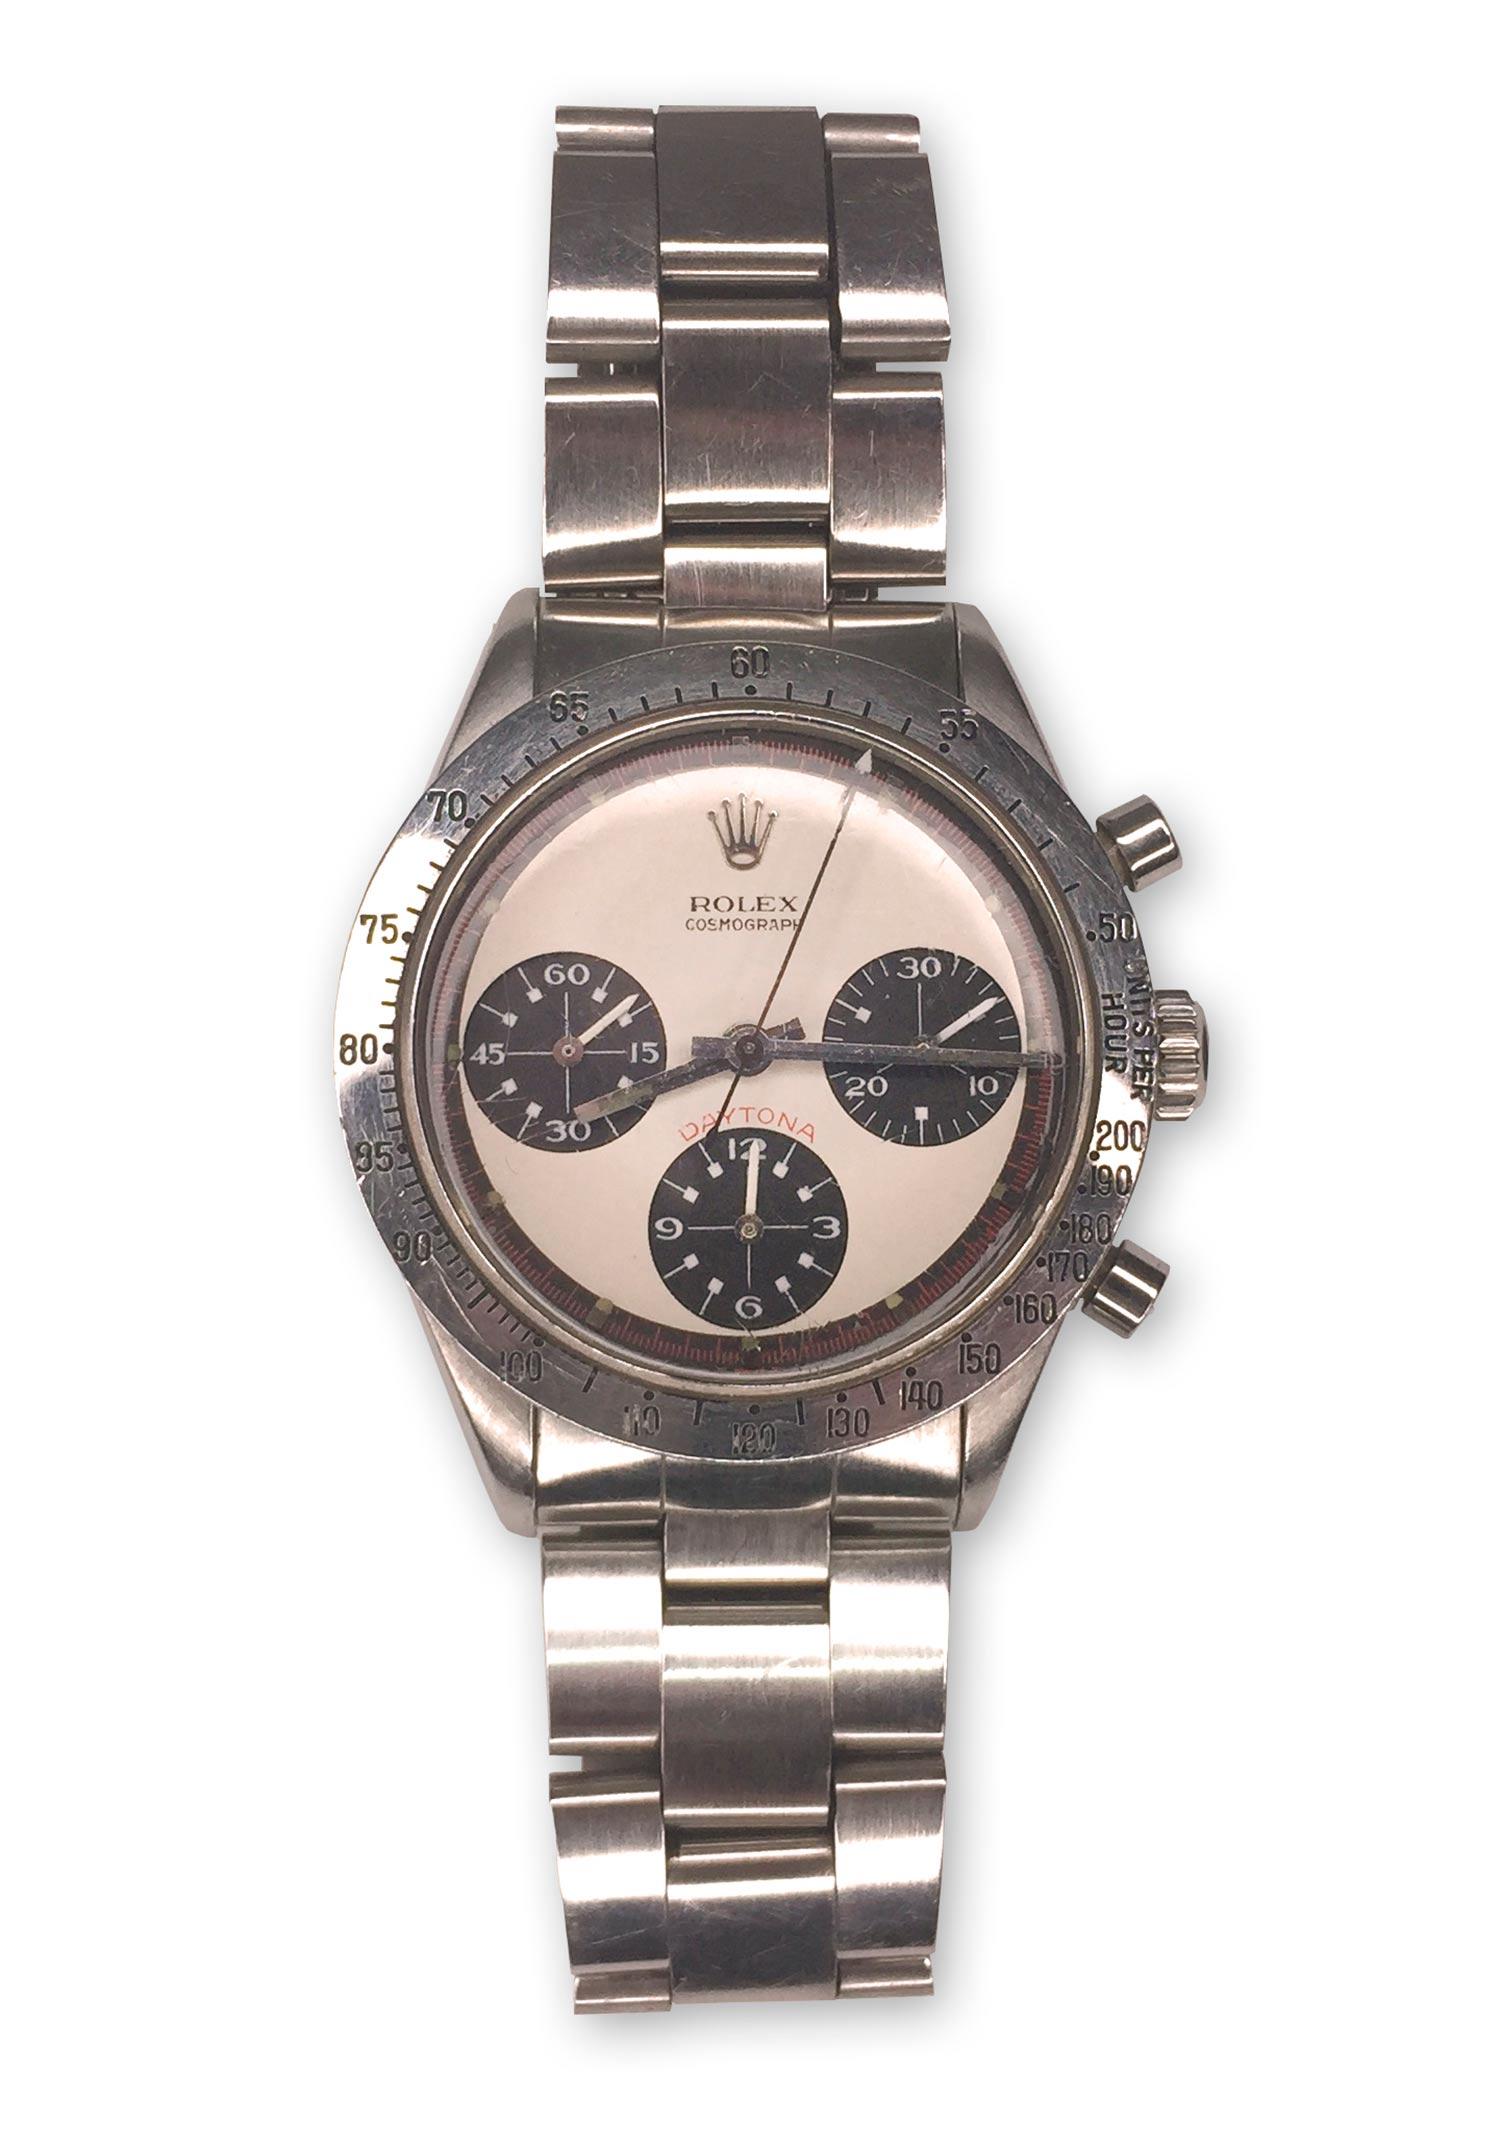 658-reloj-Rolex-Daytona-Paul-Newman-ref.-6239-en-acero.01